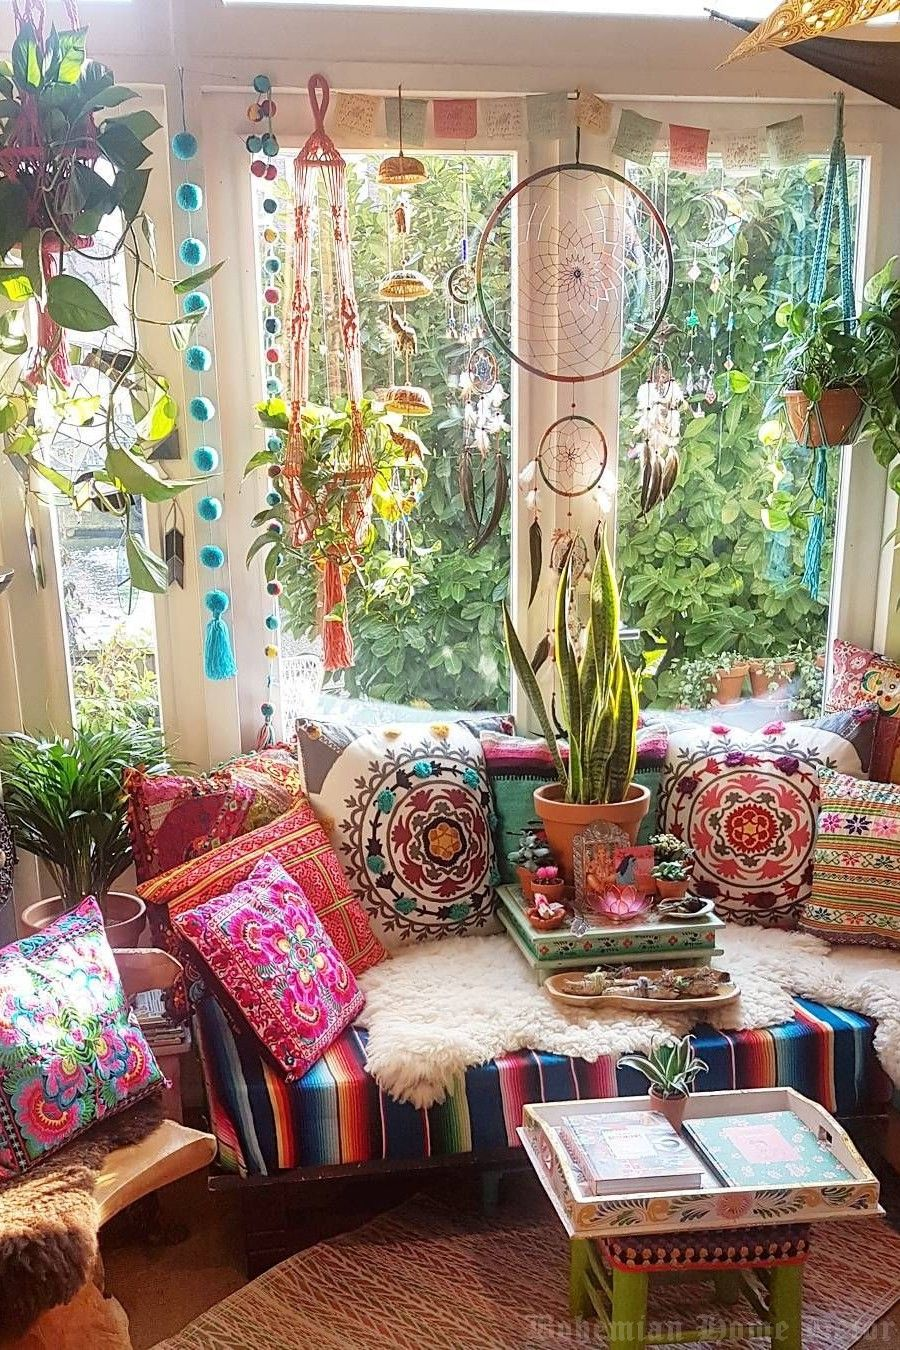 7 Life-Saving Tips About Bohemian Home Decor Oct 2020